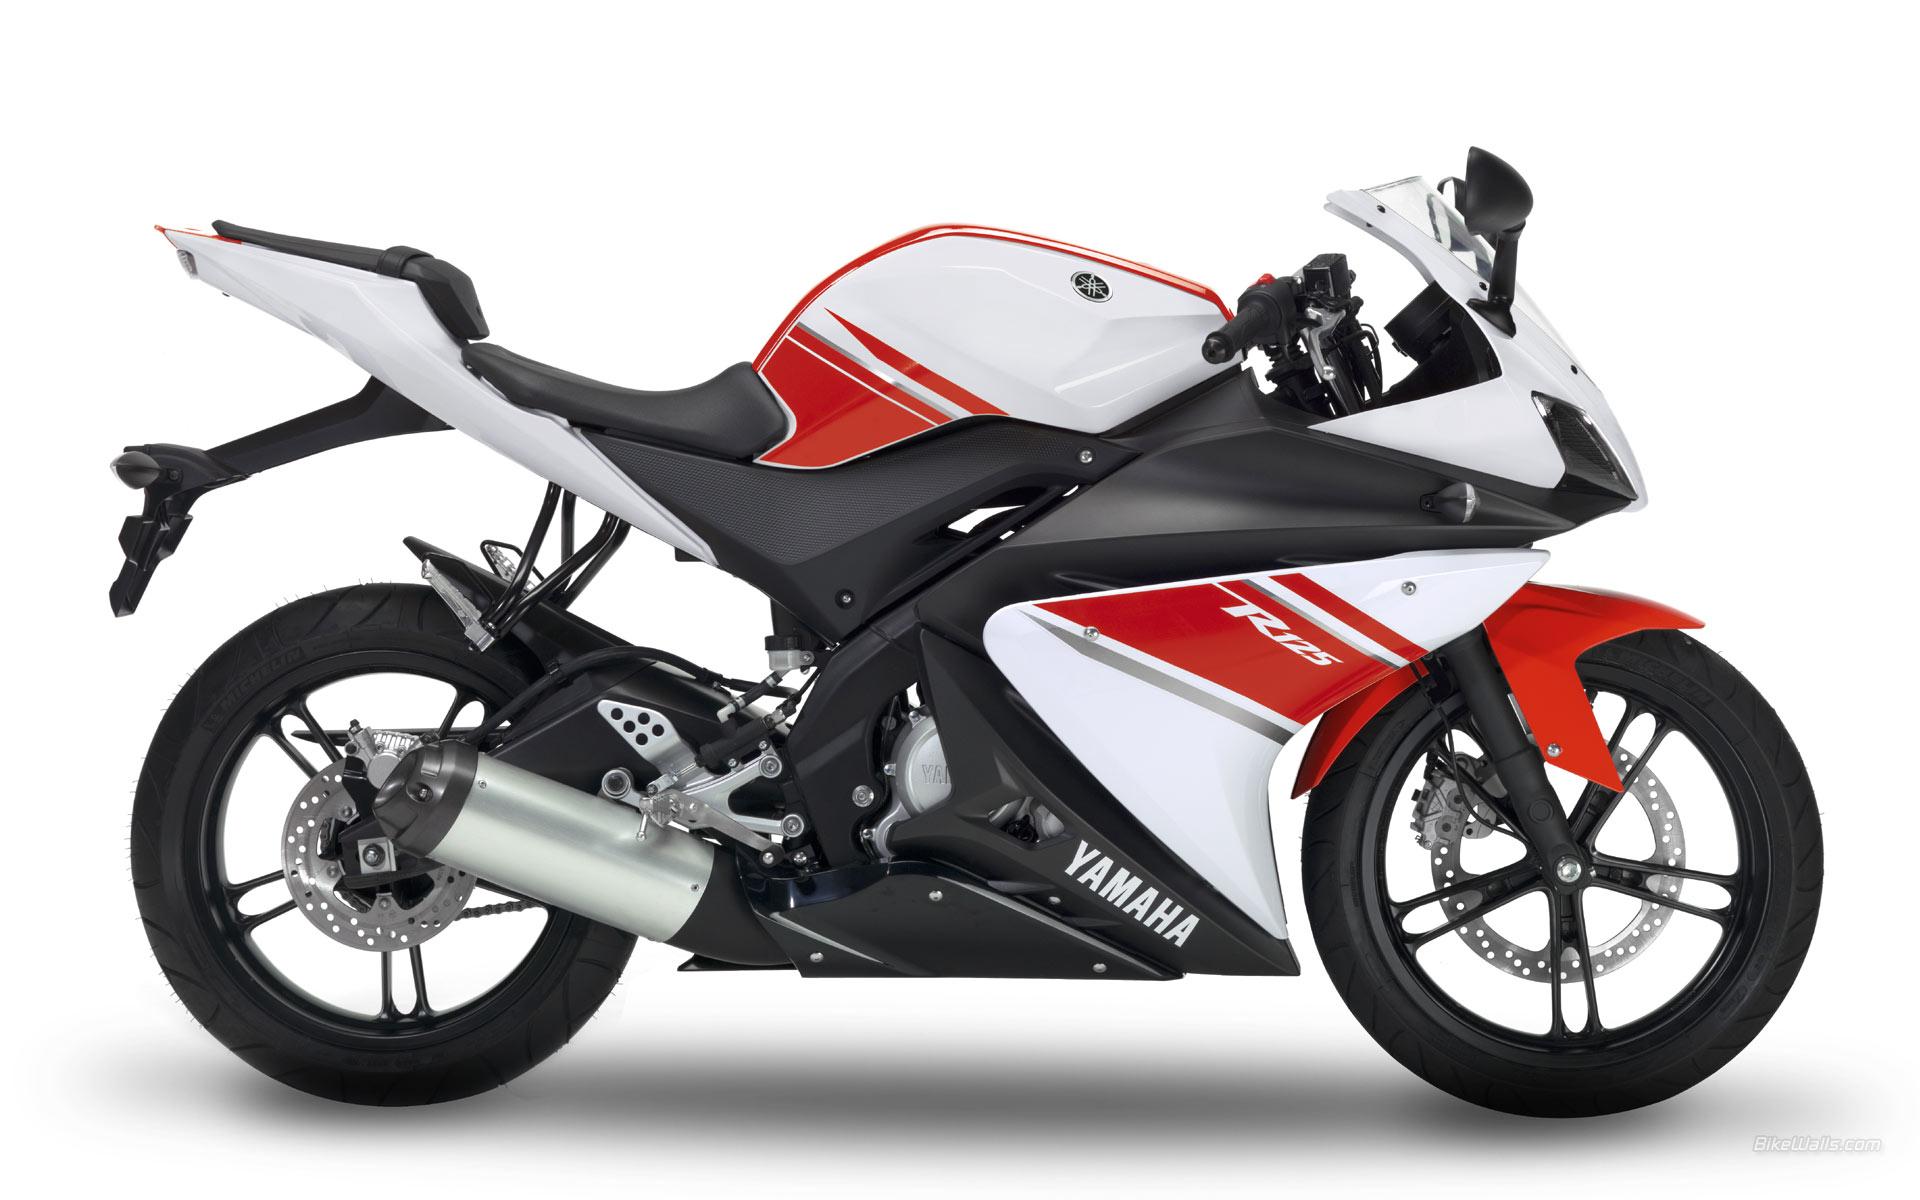 Radianss Blog  Komparasi Fitur Yamaha YZF R125 vs Kawasaki Ninja 250R